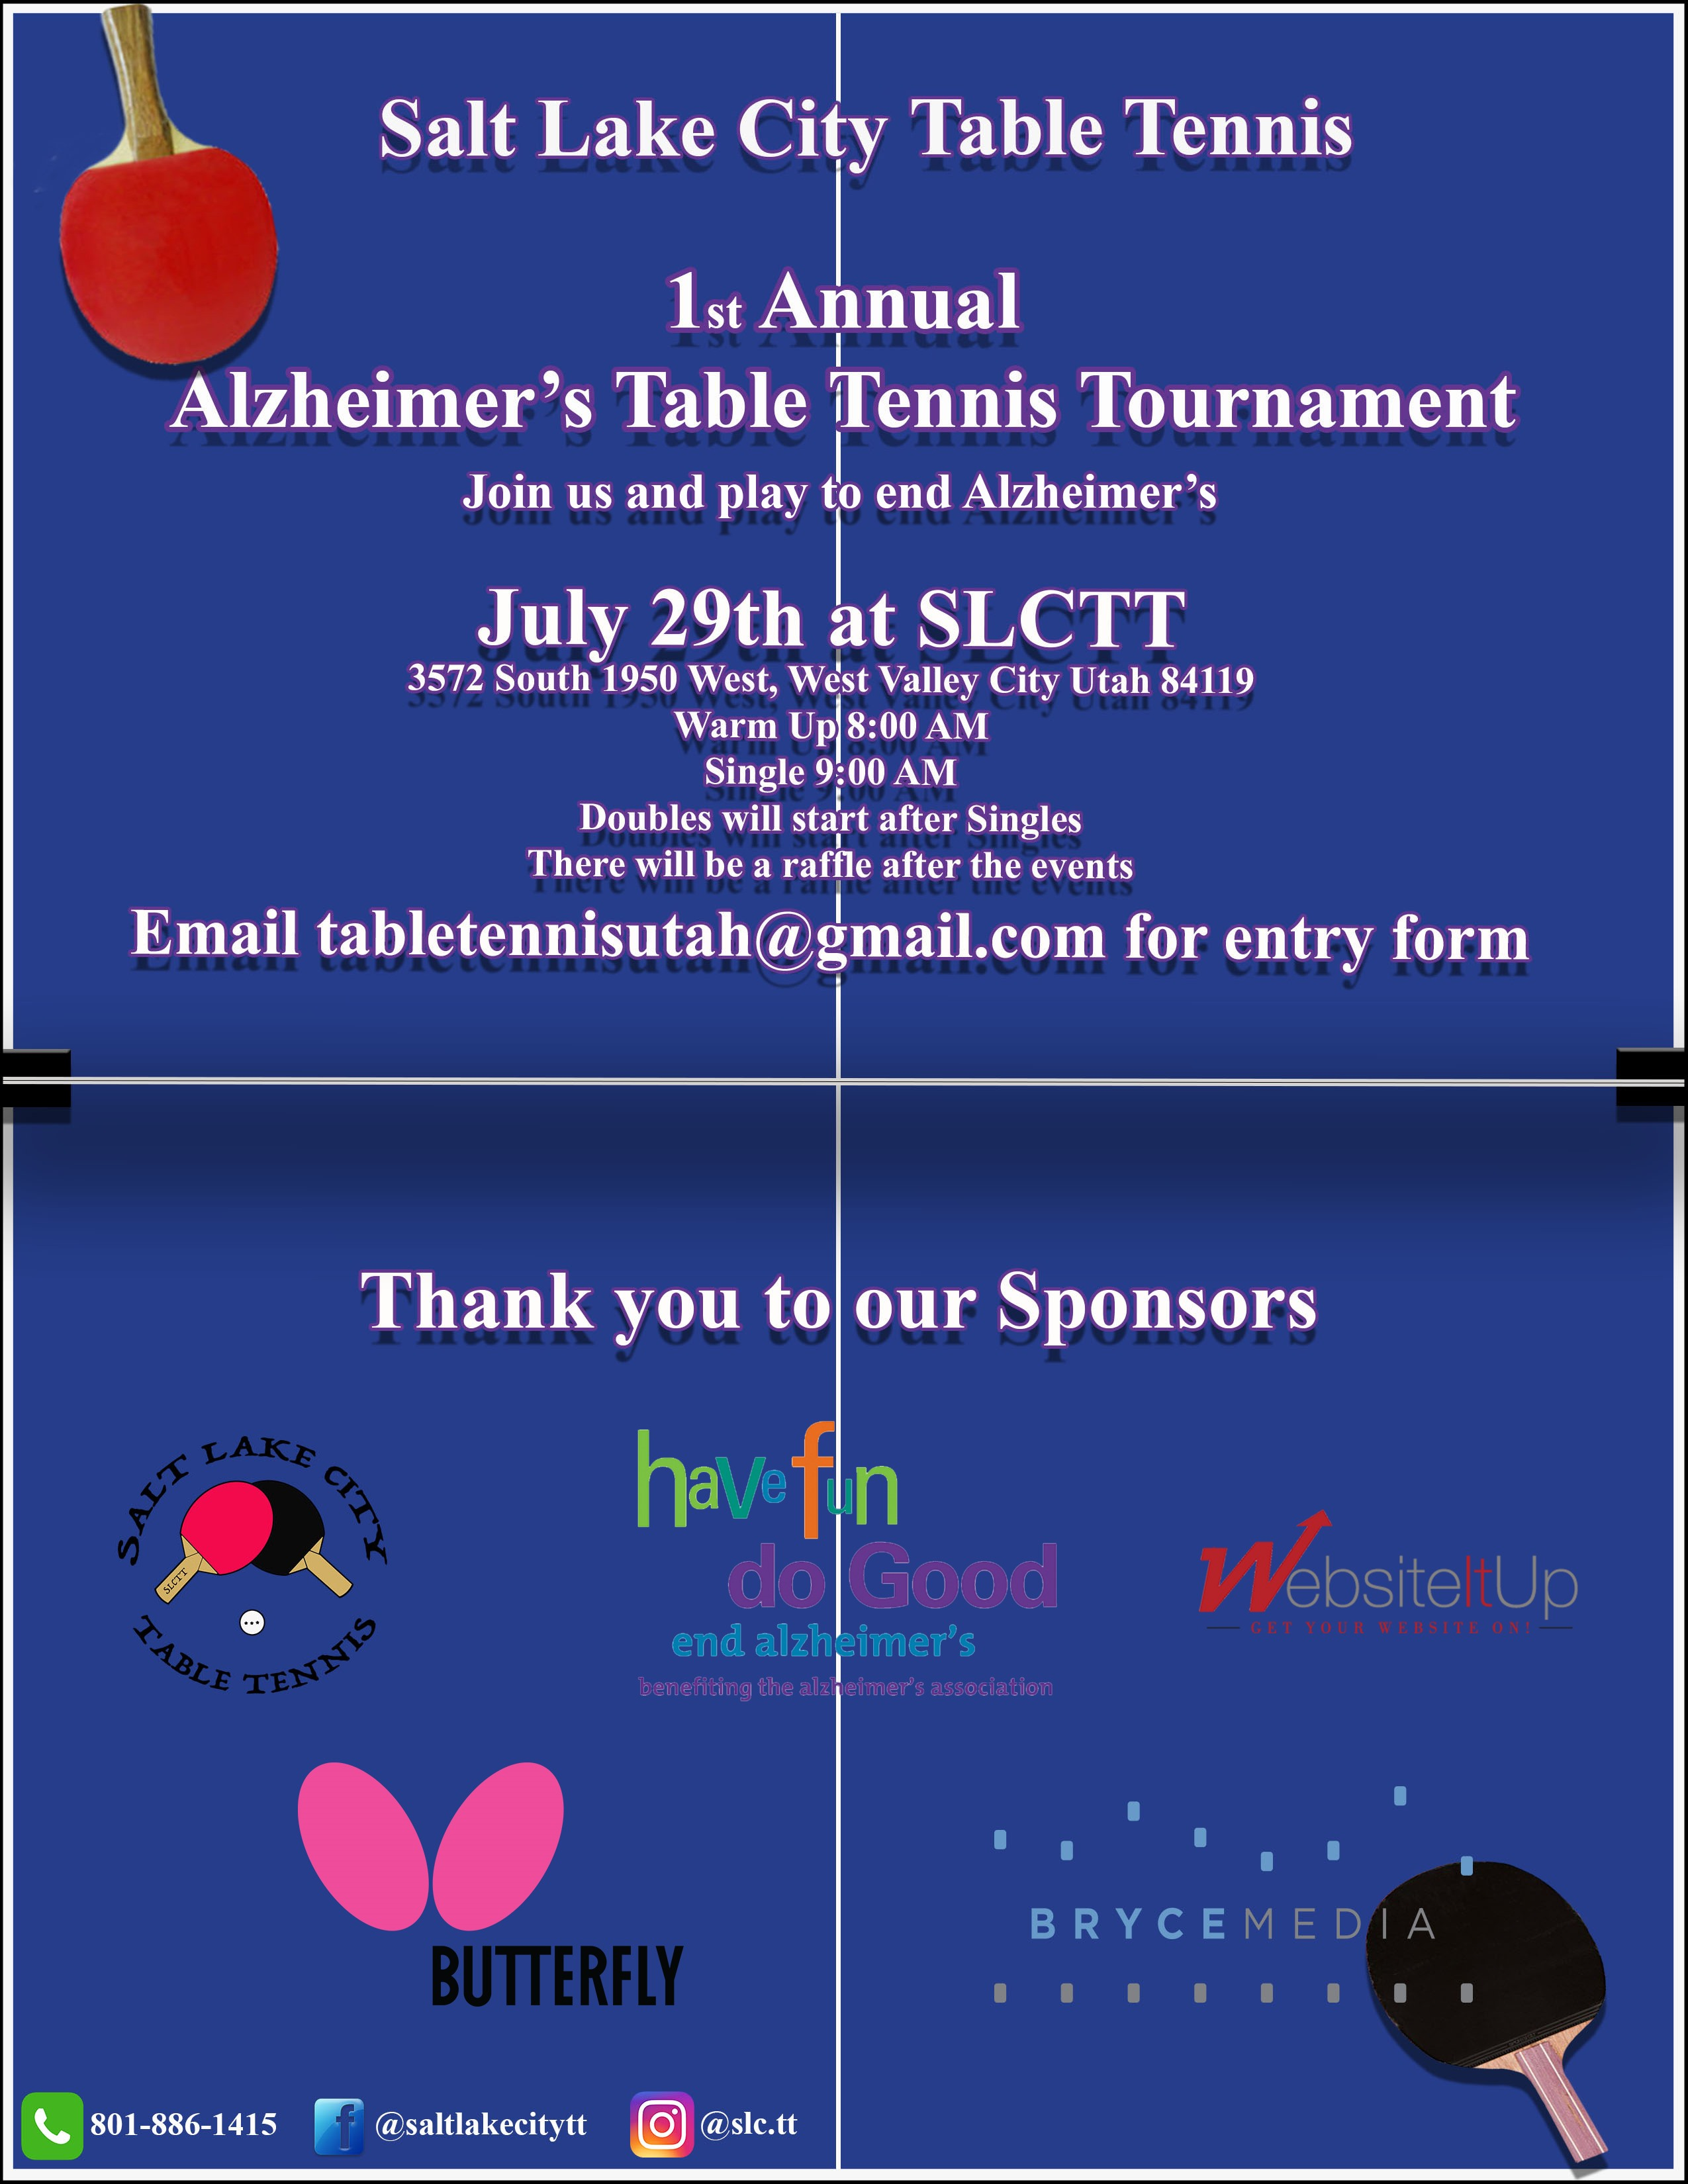 Bowmar Sports sponsoring Alzheimer's fundraiser tournament